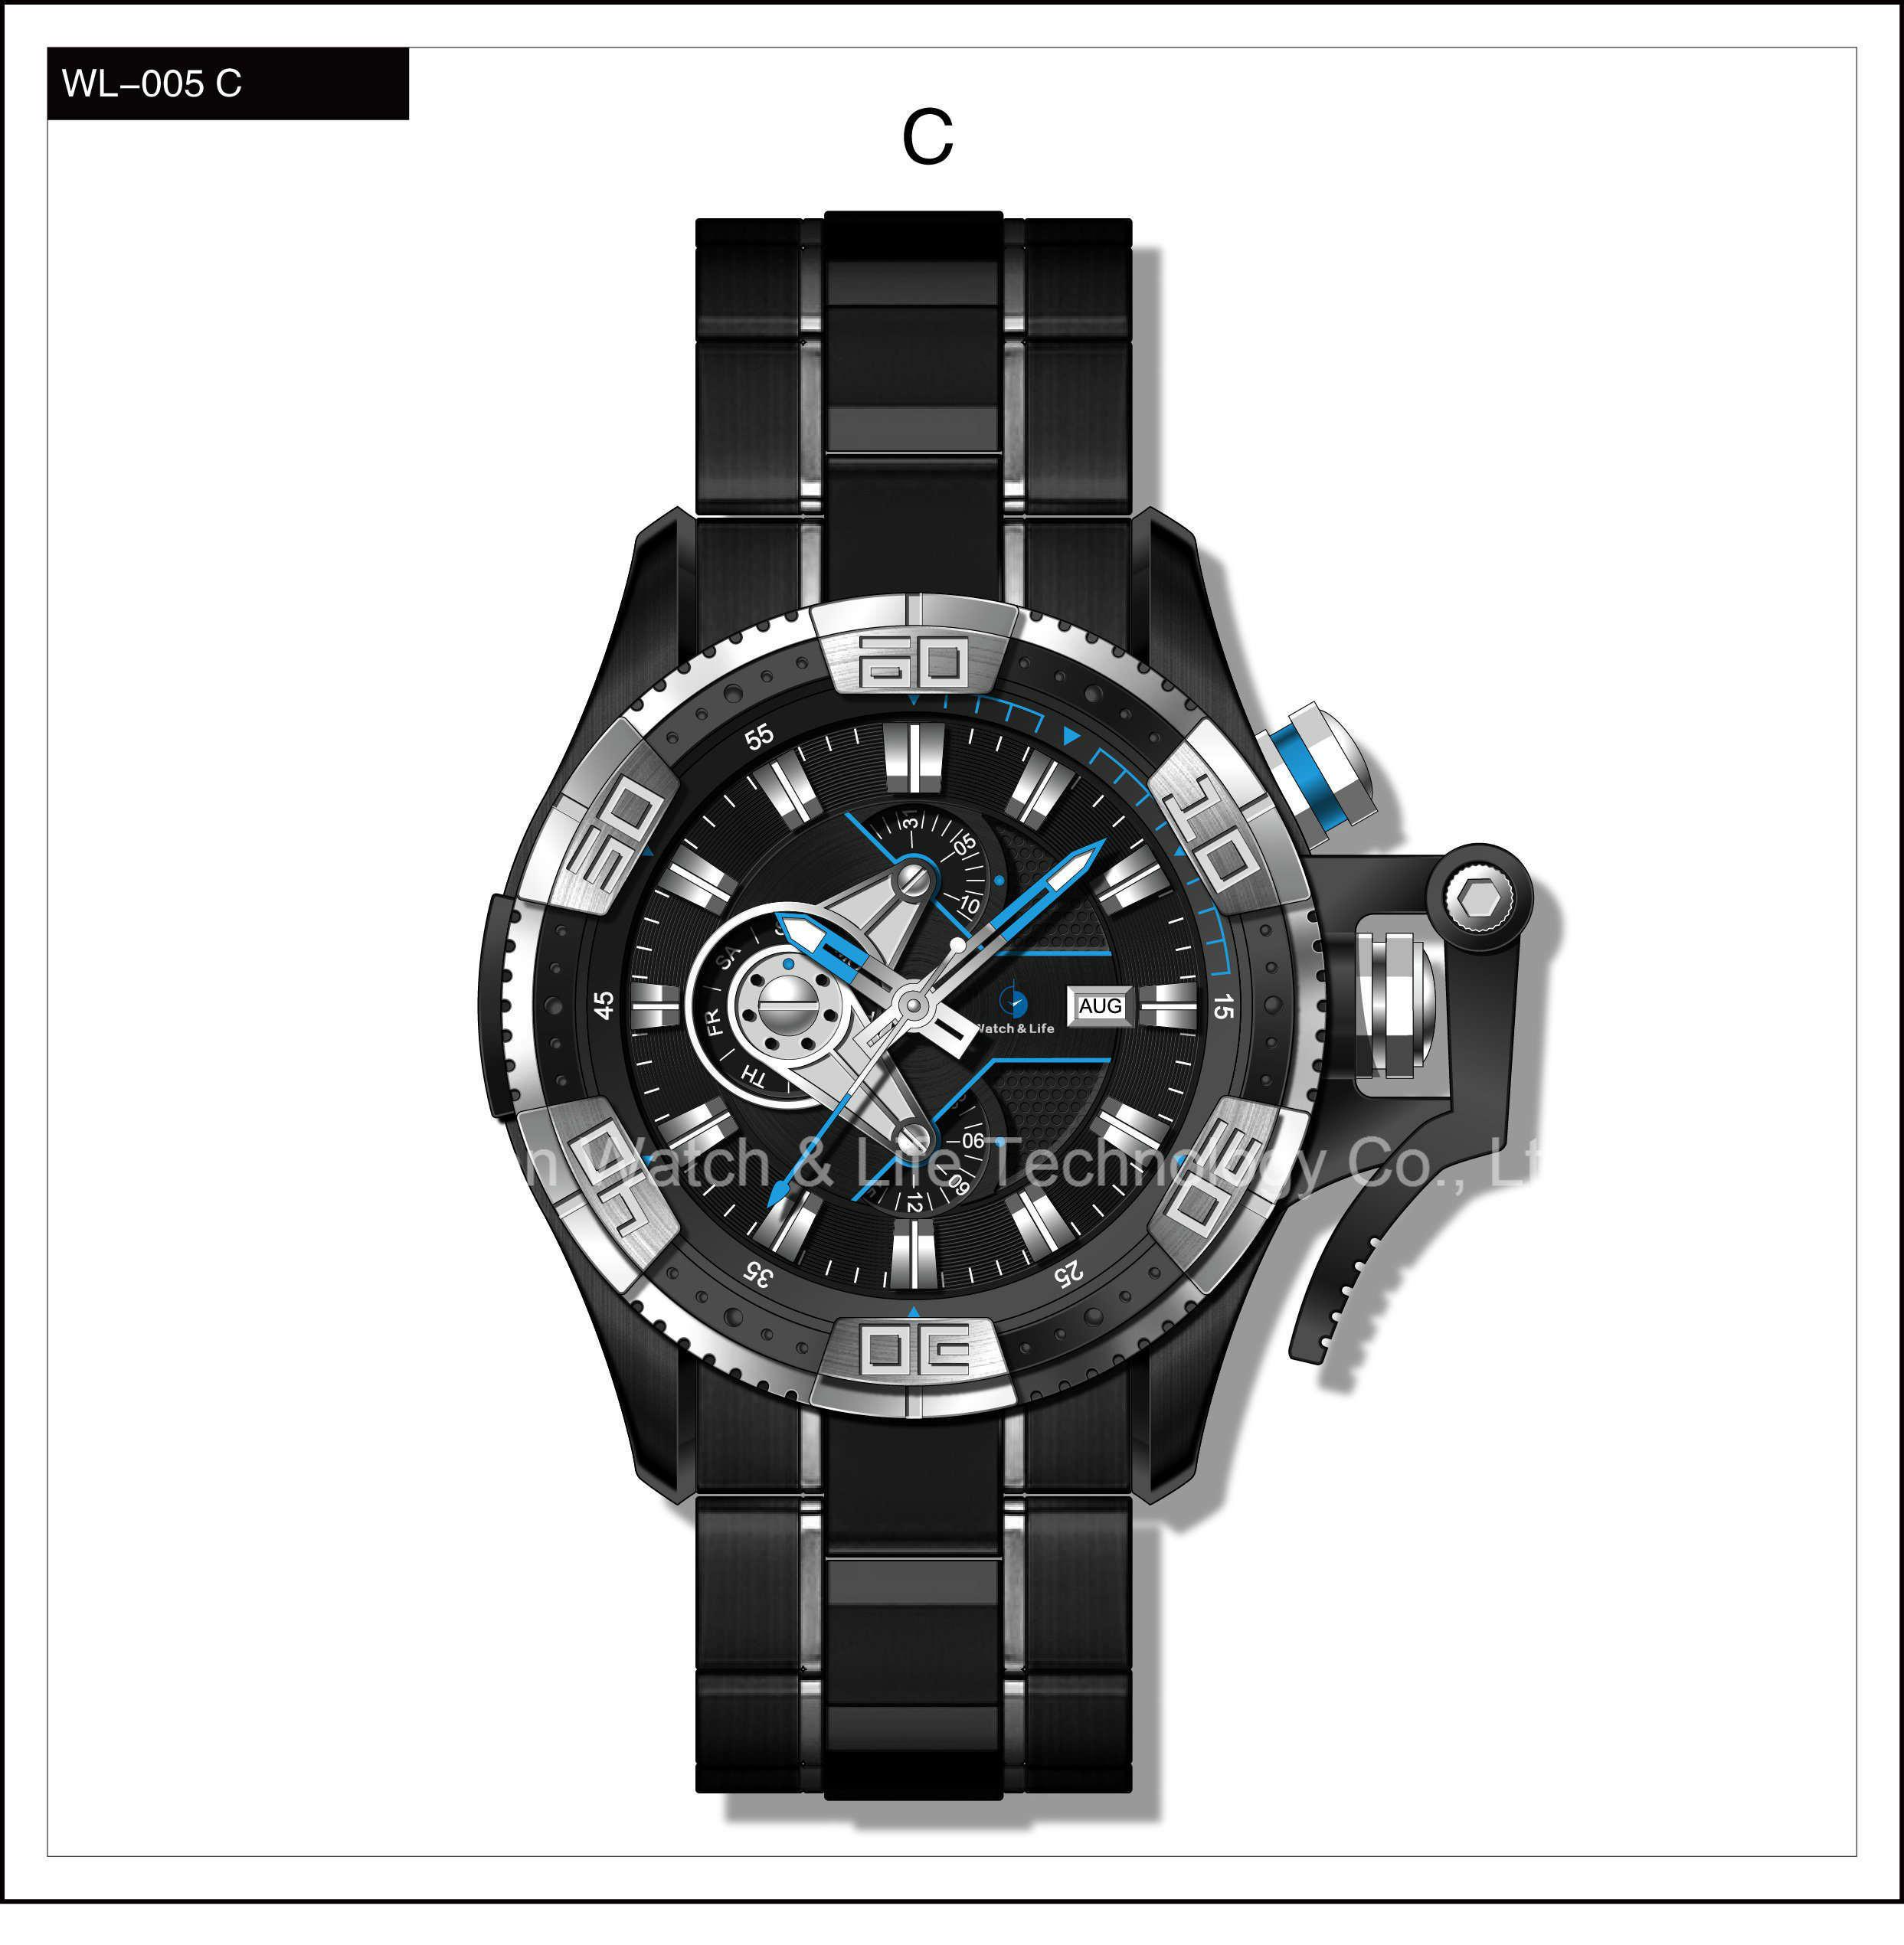 Mechanical Speical Fashion Sport Swiss Watch Stainless Steel Men′s Wrist Watch